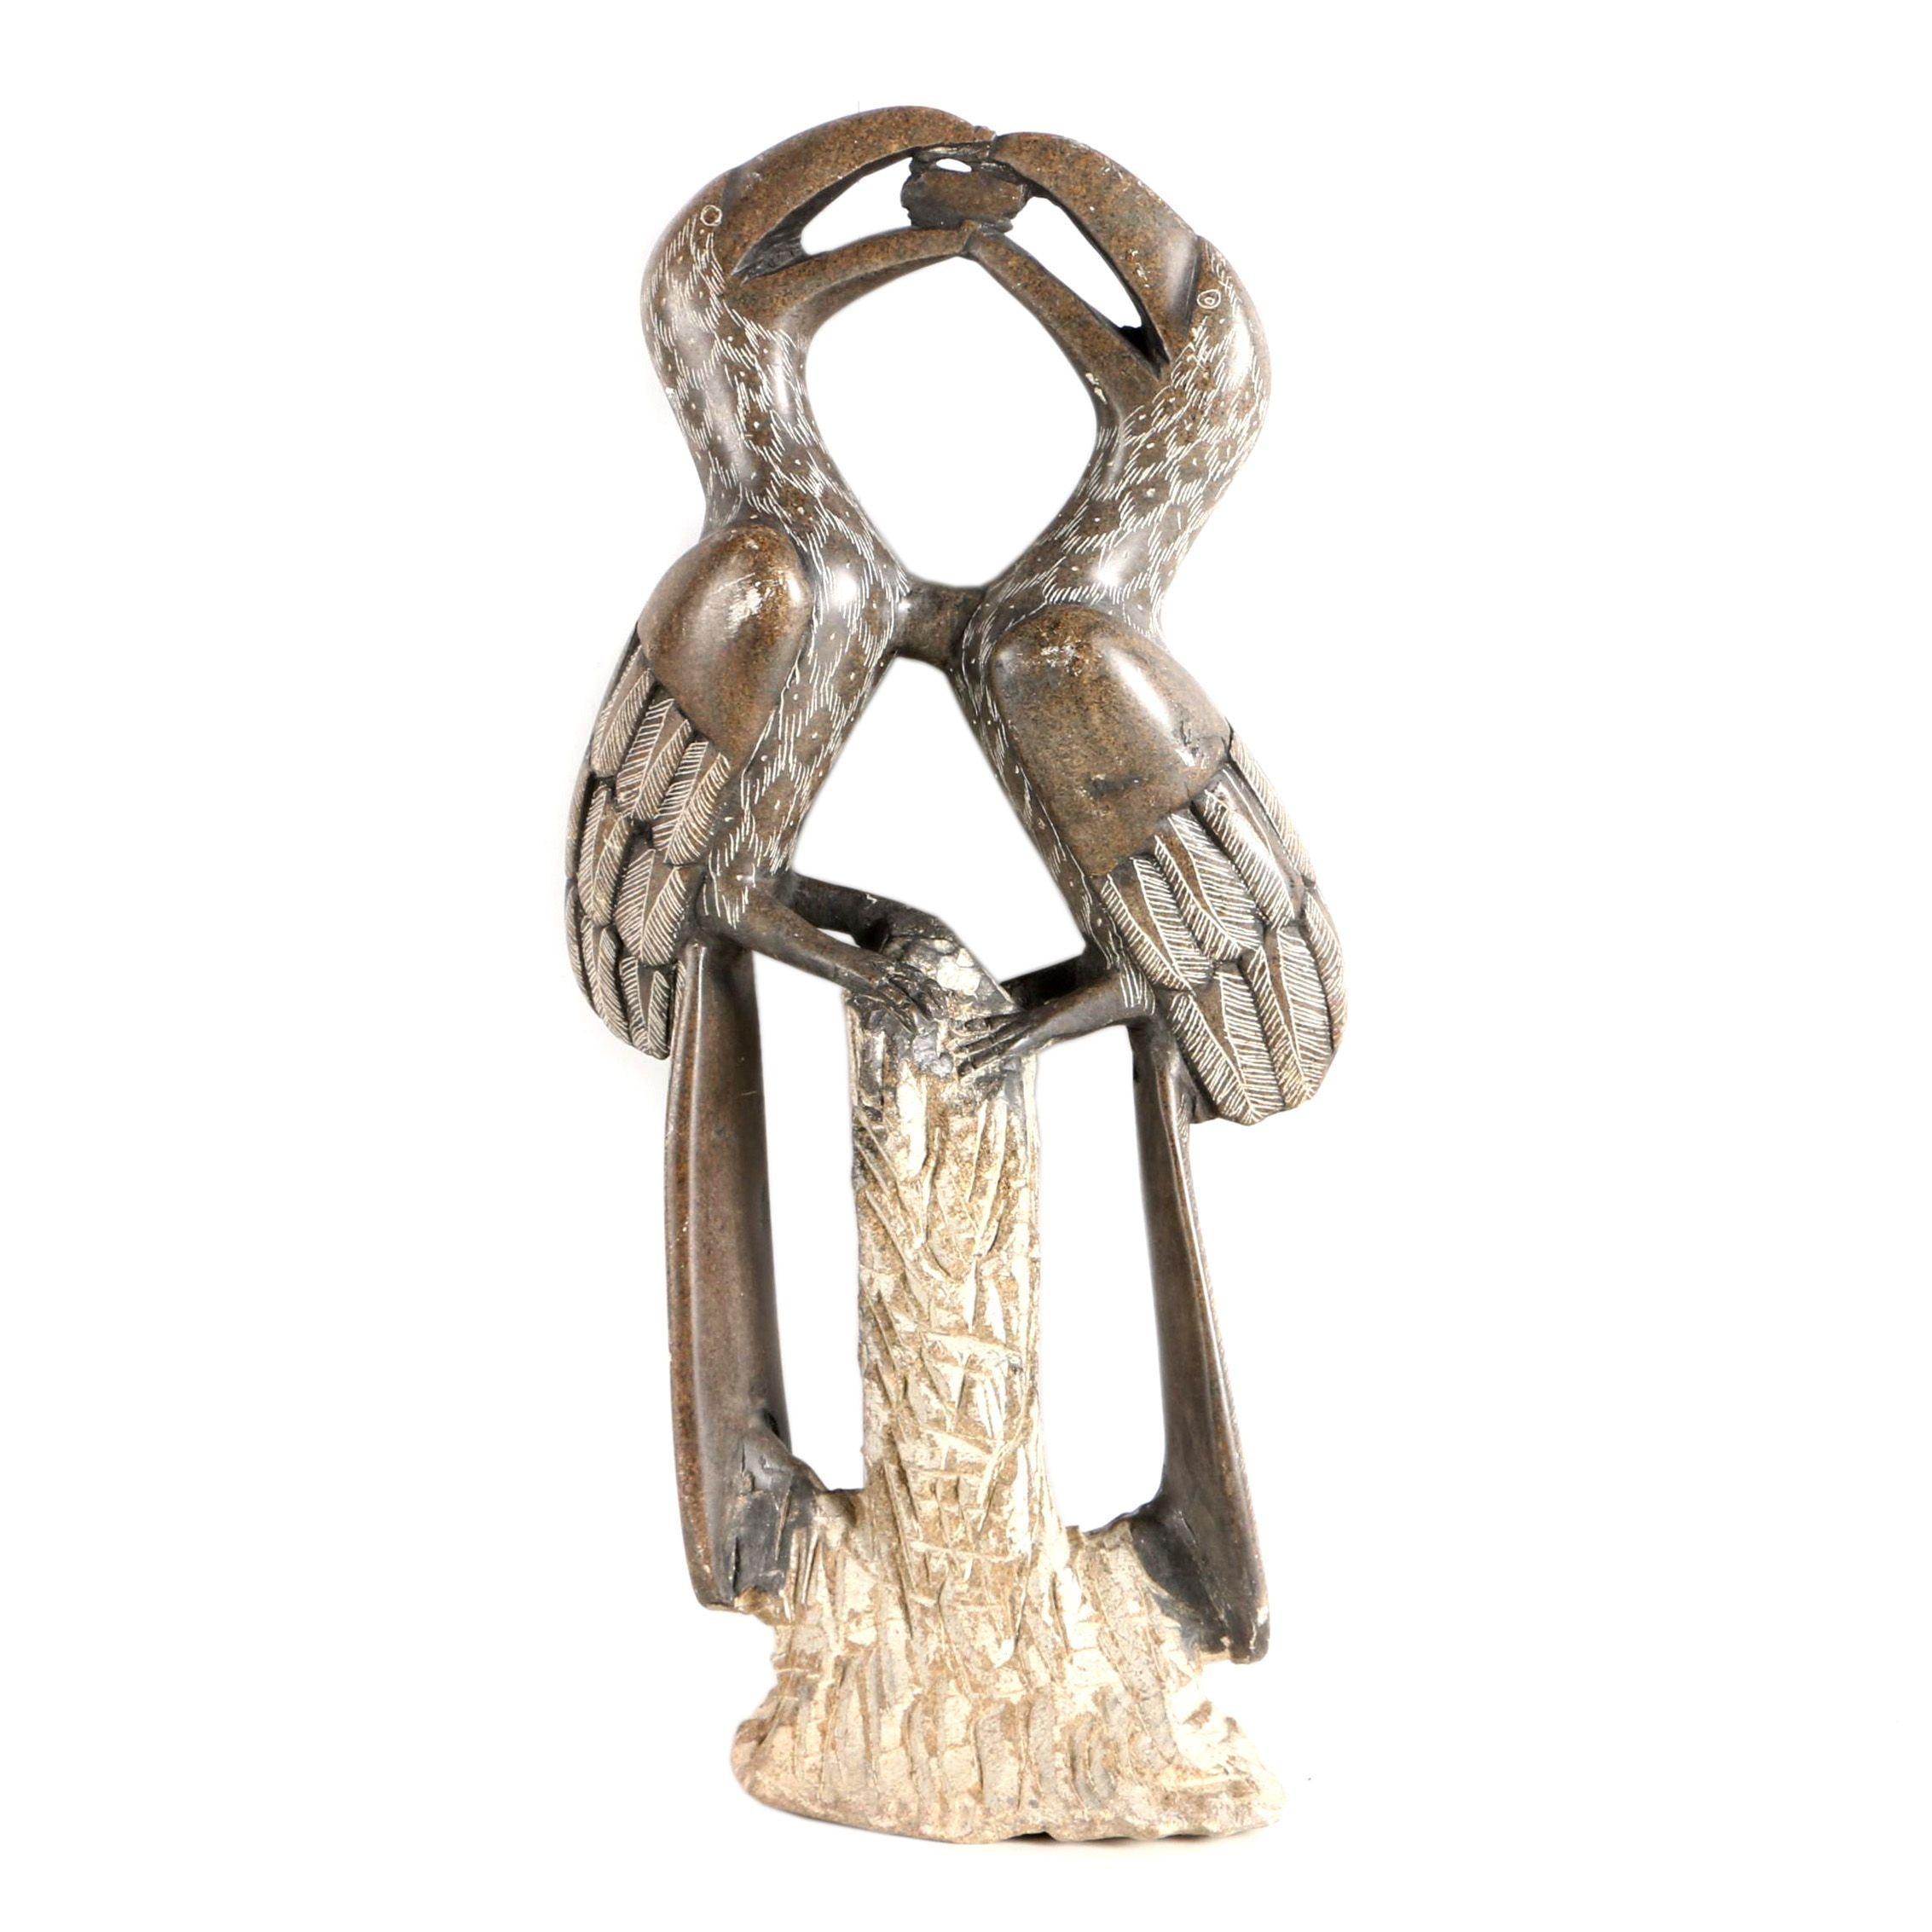 Carved Stone Hornbill Sculpture